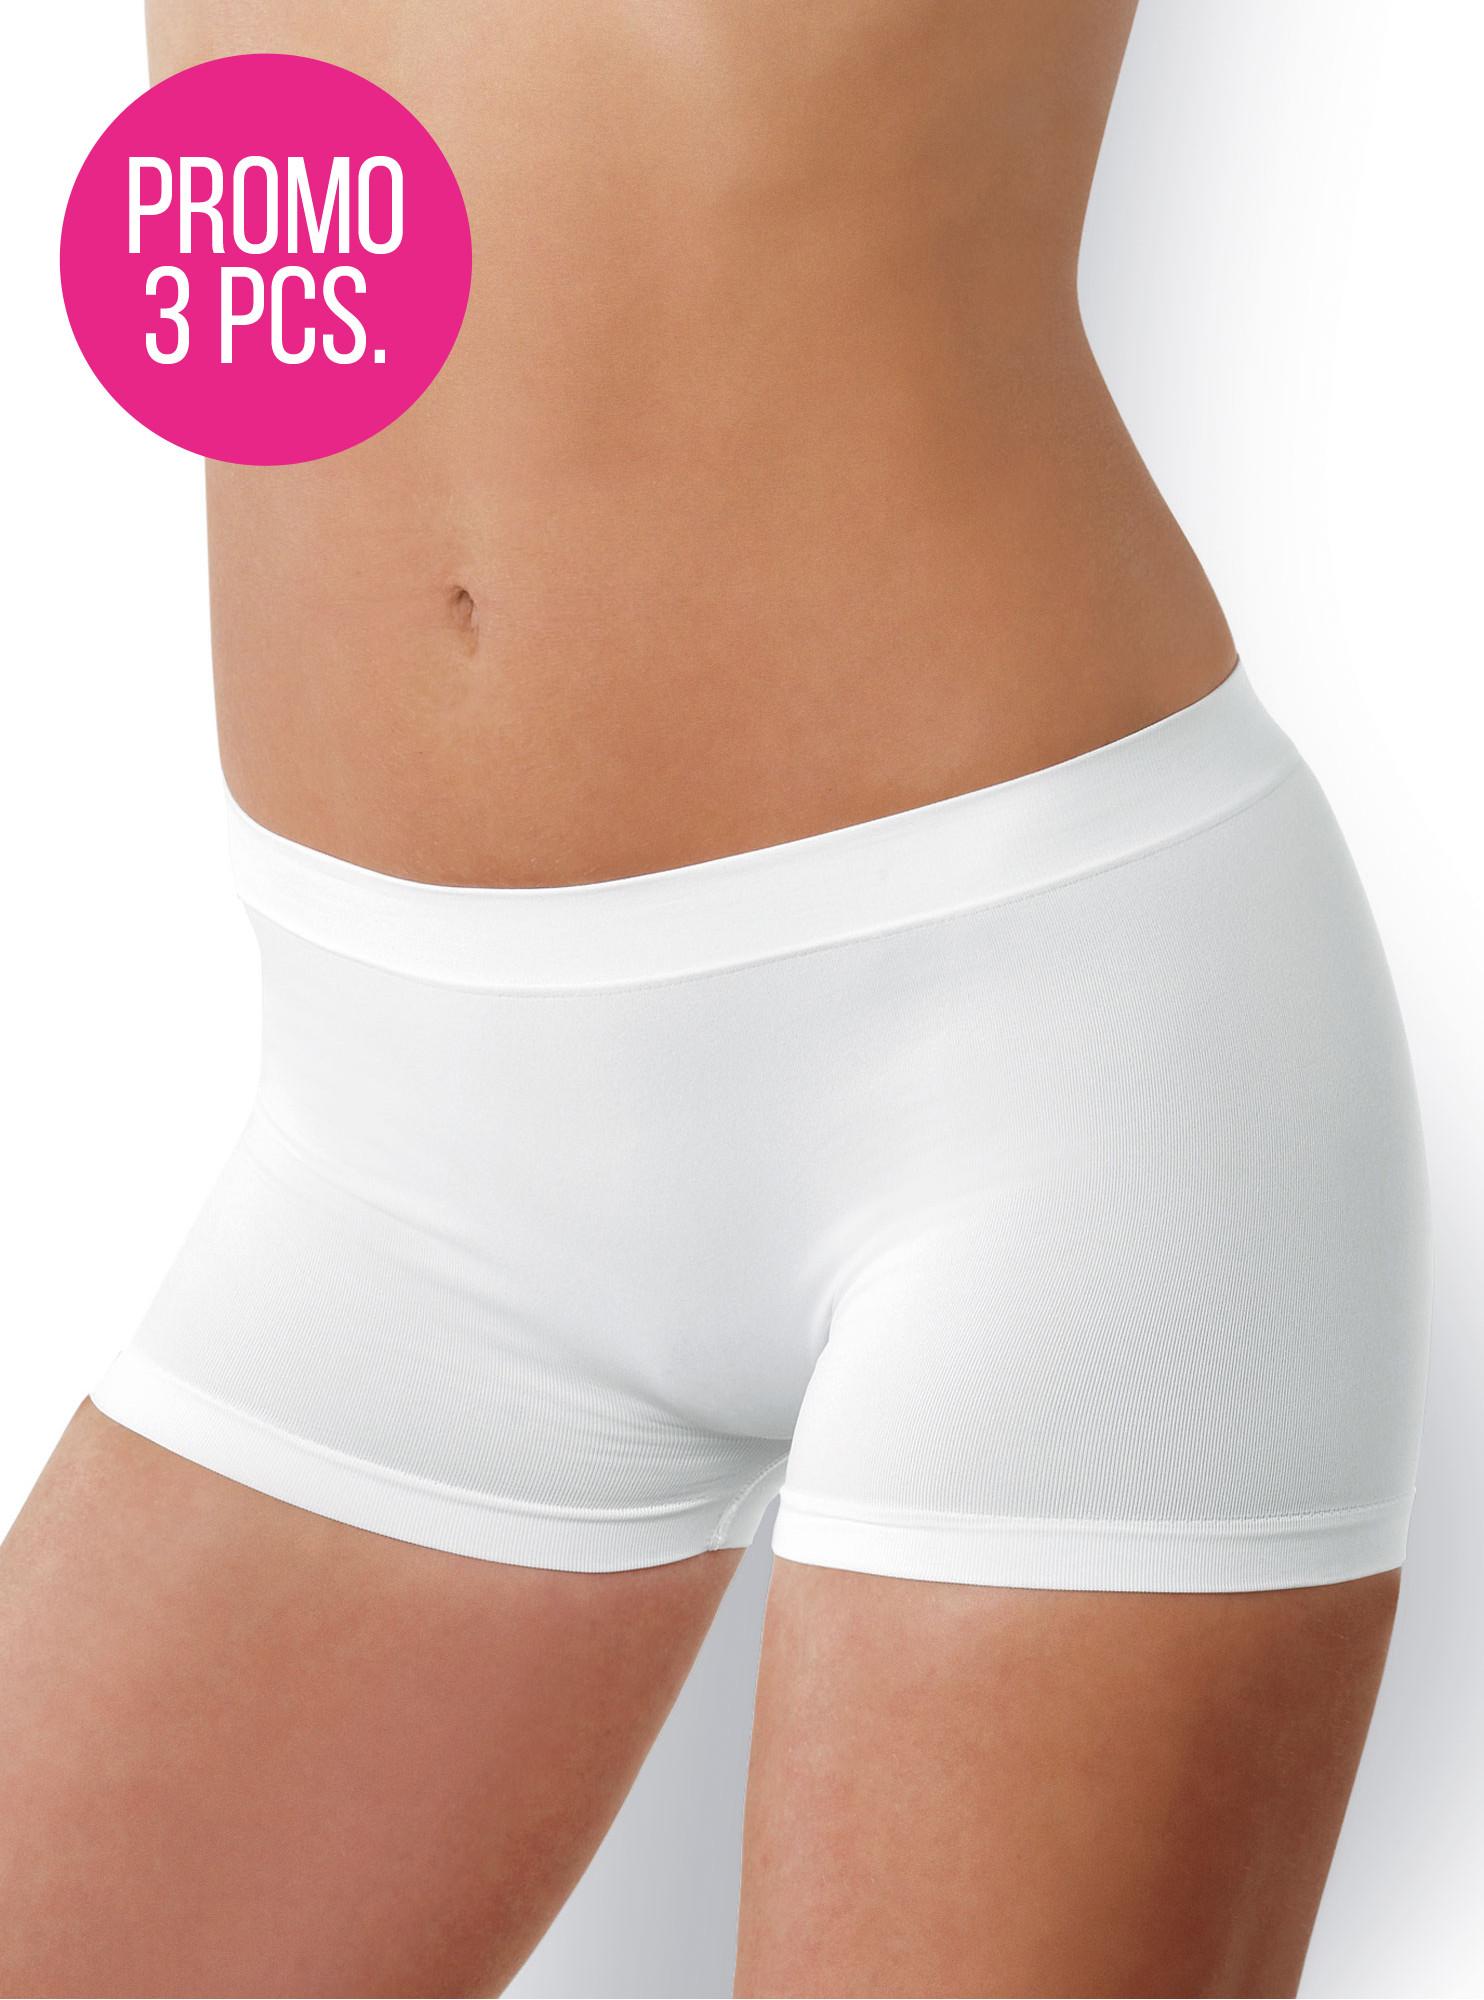 Panty Florida Promo 3 Pezzi